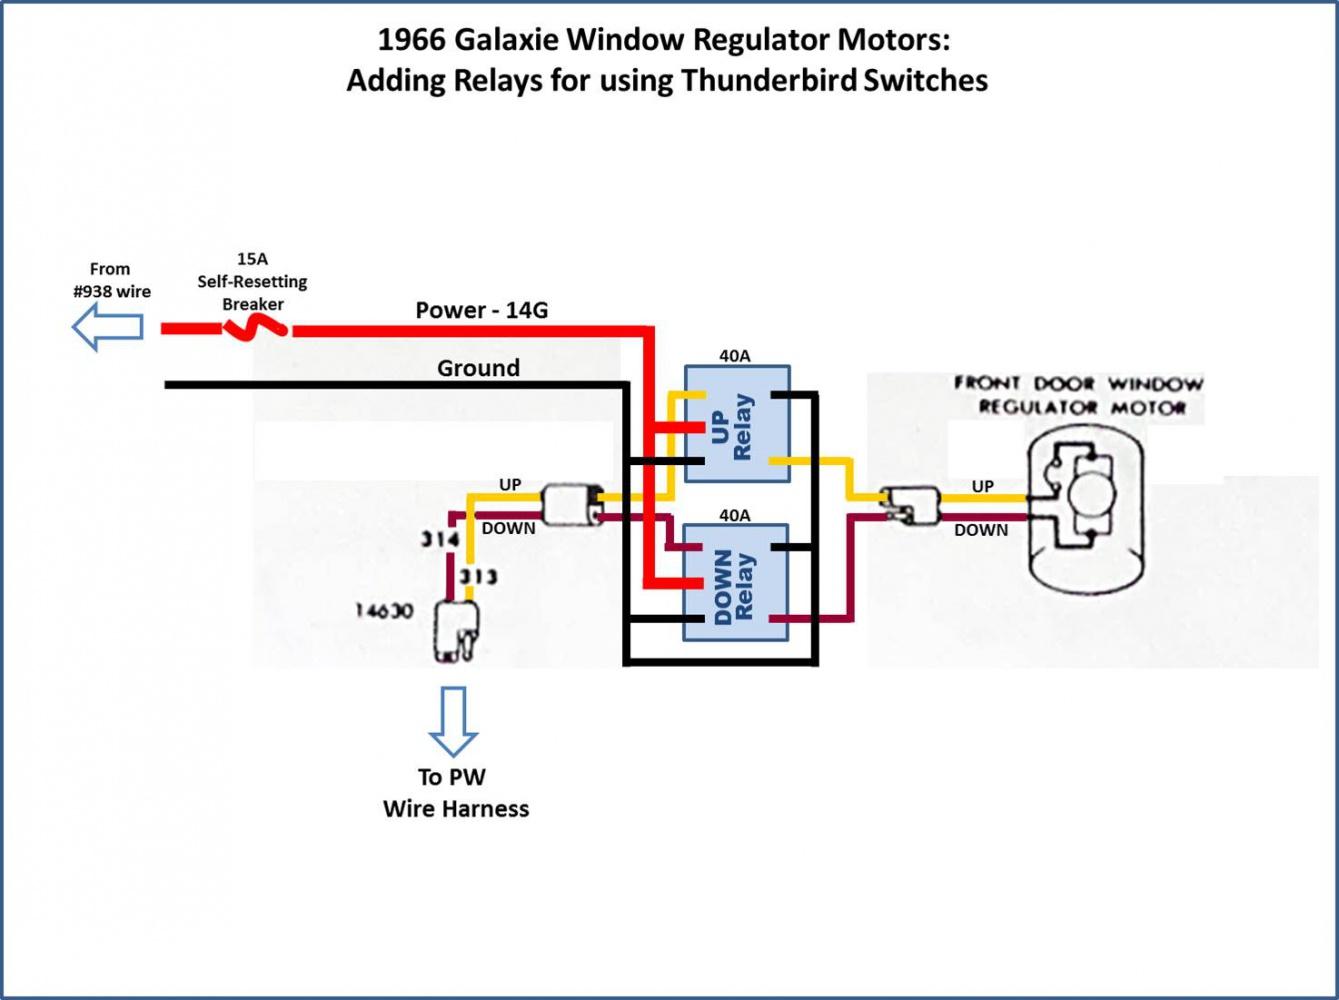 1962 Corvette Wiring Diagram Power Window Conversion 1966 Thunderbird Switches In